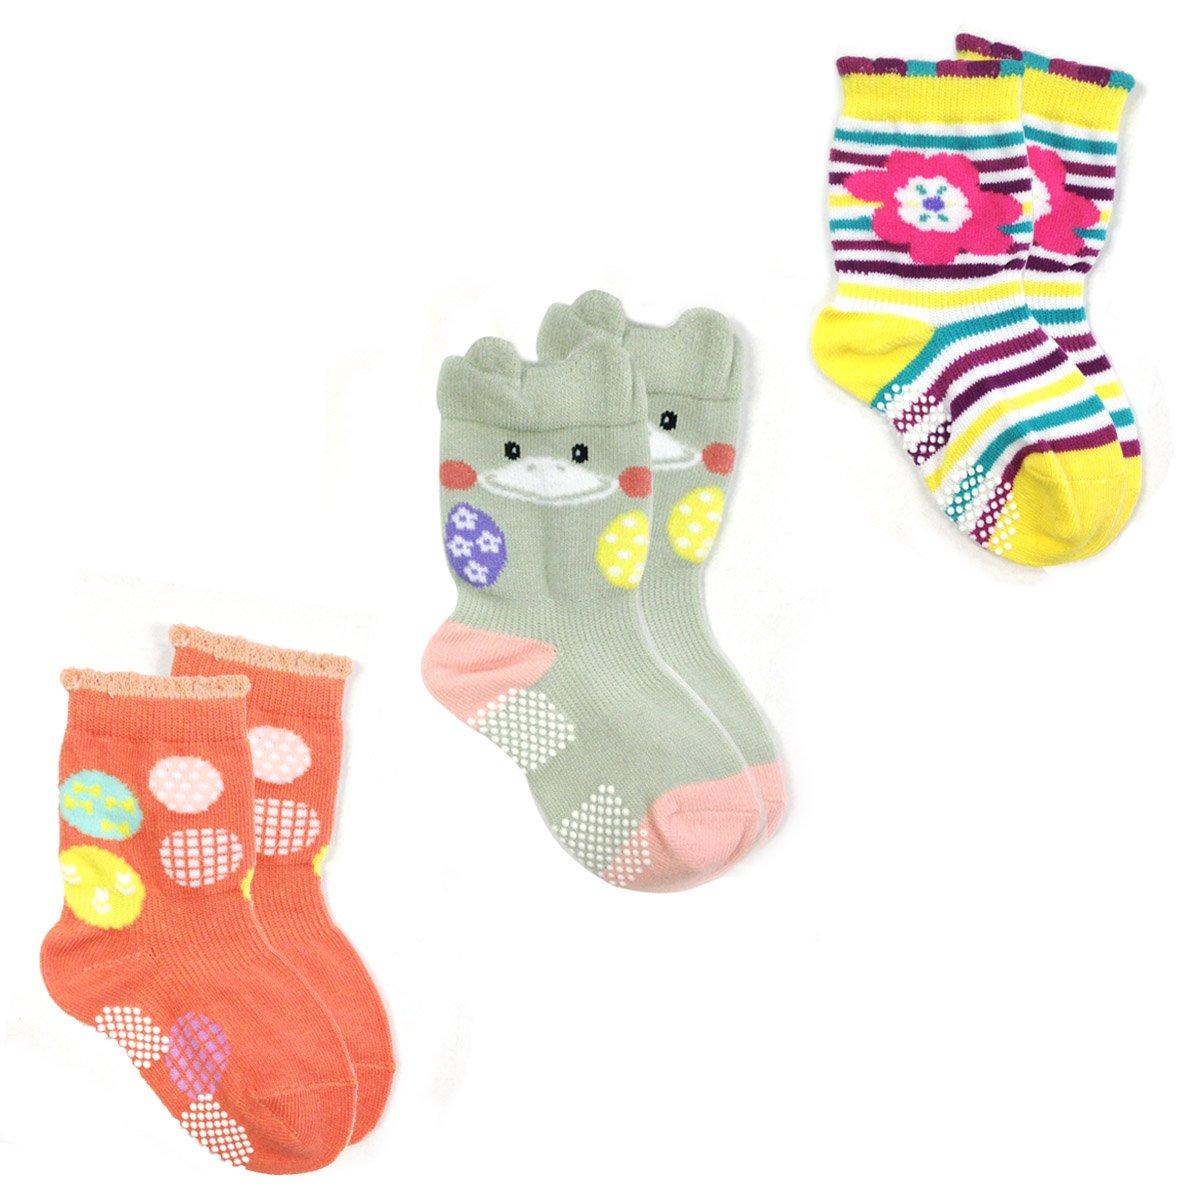 Selling Allydrew Animal Non-Skid Topics on TV Toddler Socks 3 Duck L Set of